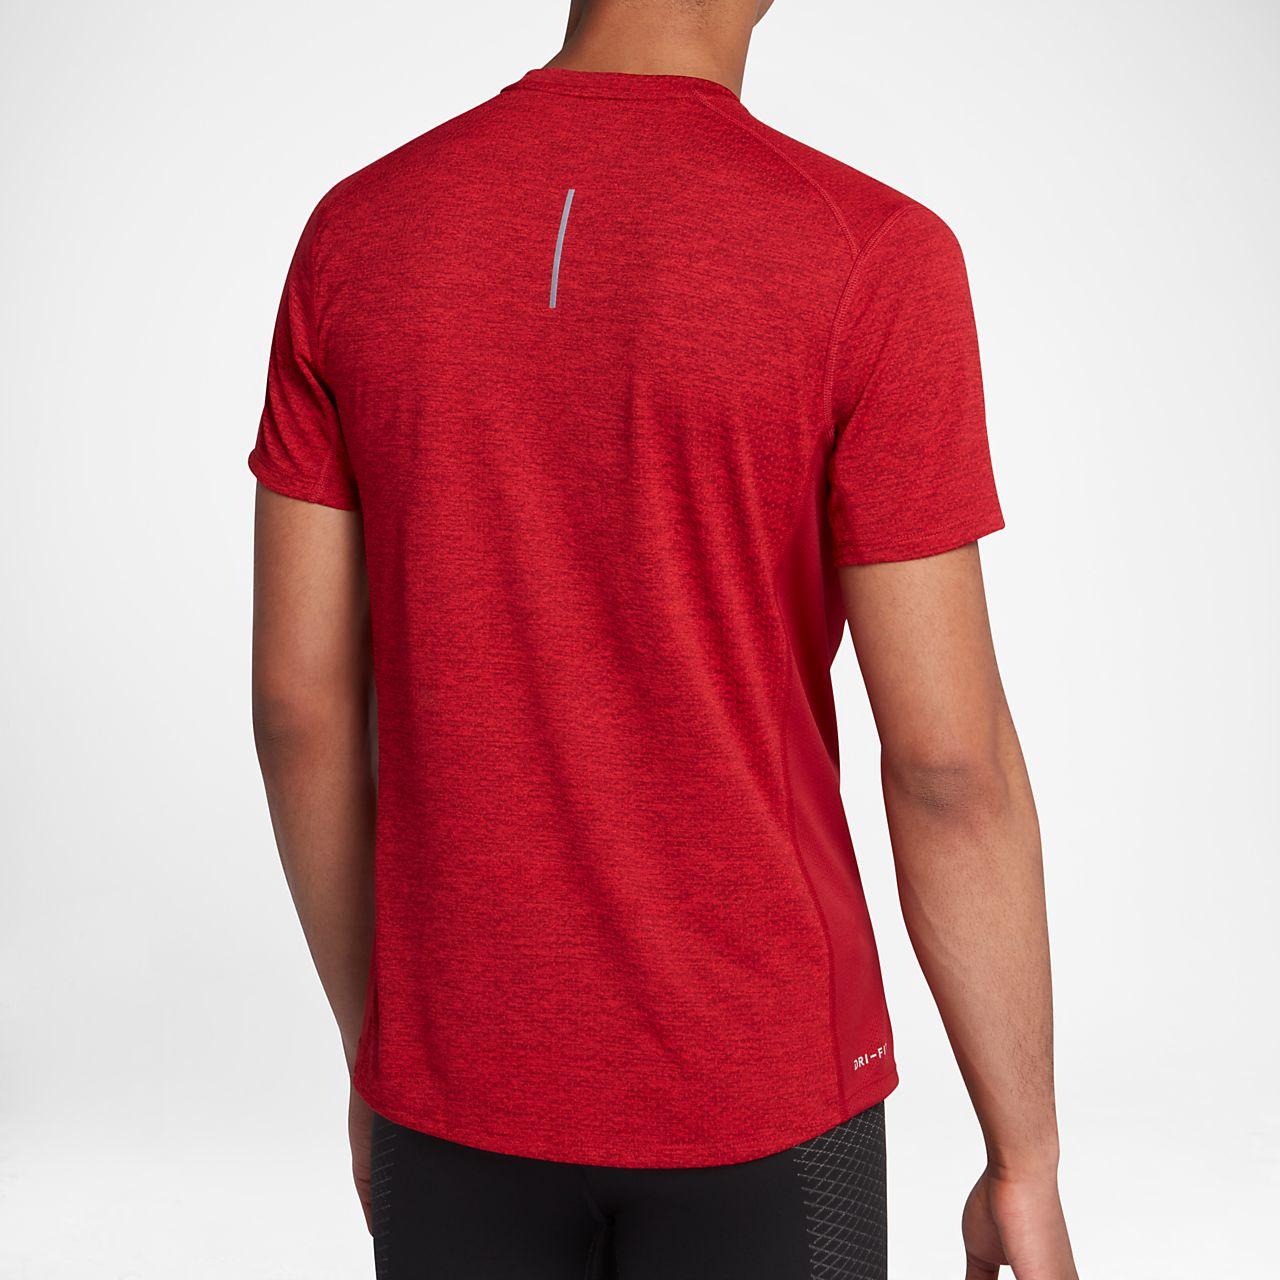 ... Nike Cool Miler Men's Short-Sleeve Running Top